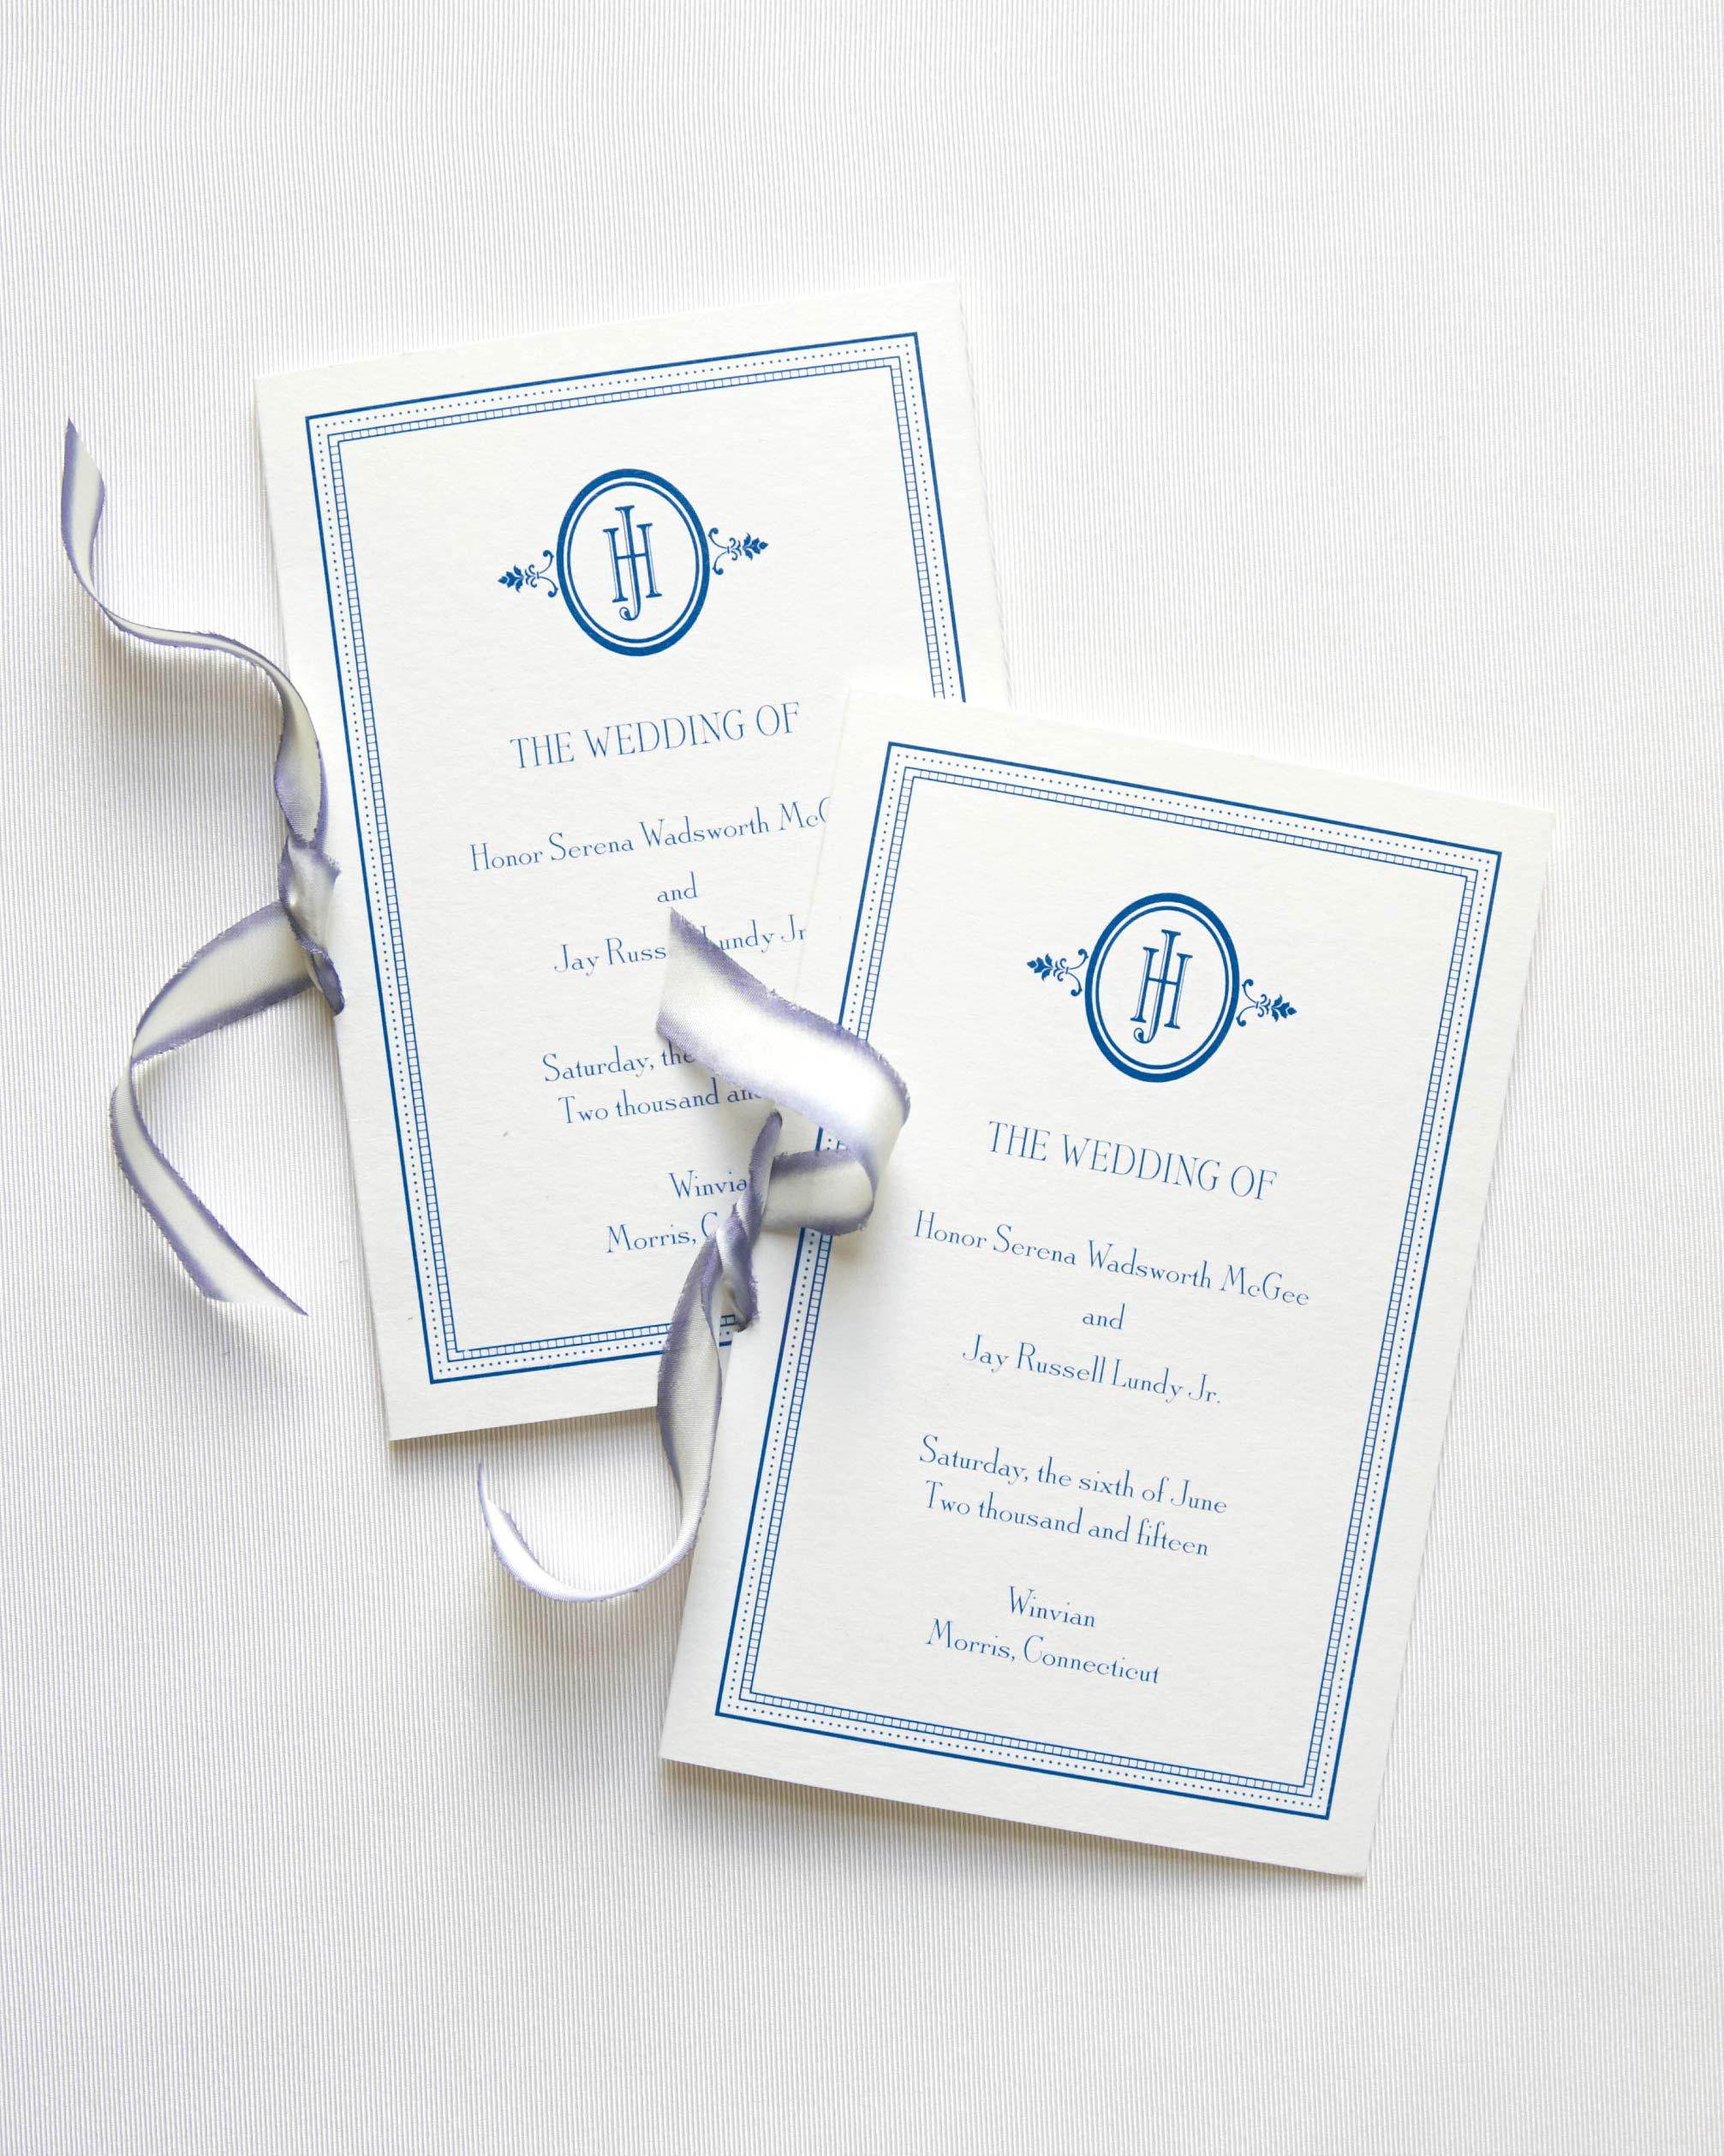 mhonor-jay-wedding-connecticut-blue-invitations-002-d112238.jpg